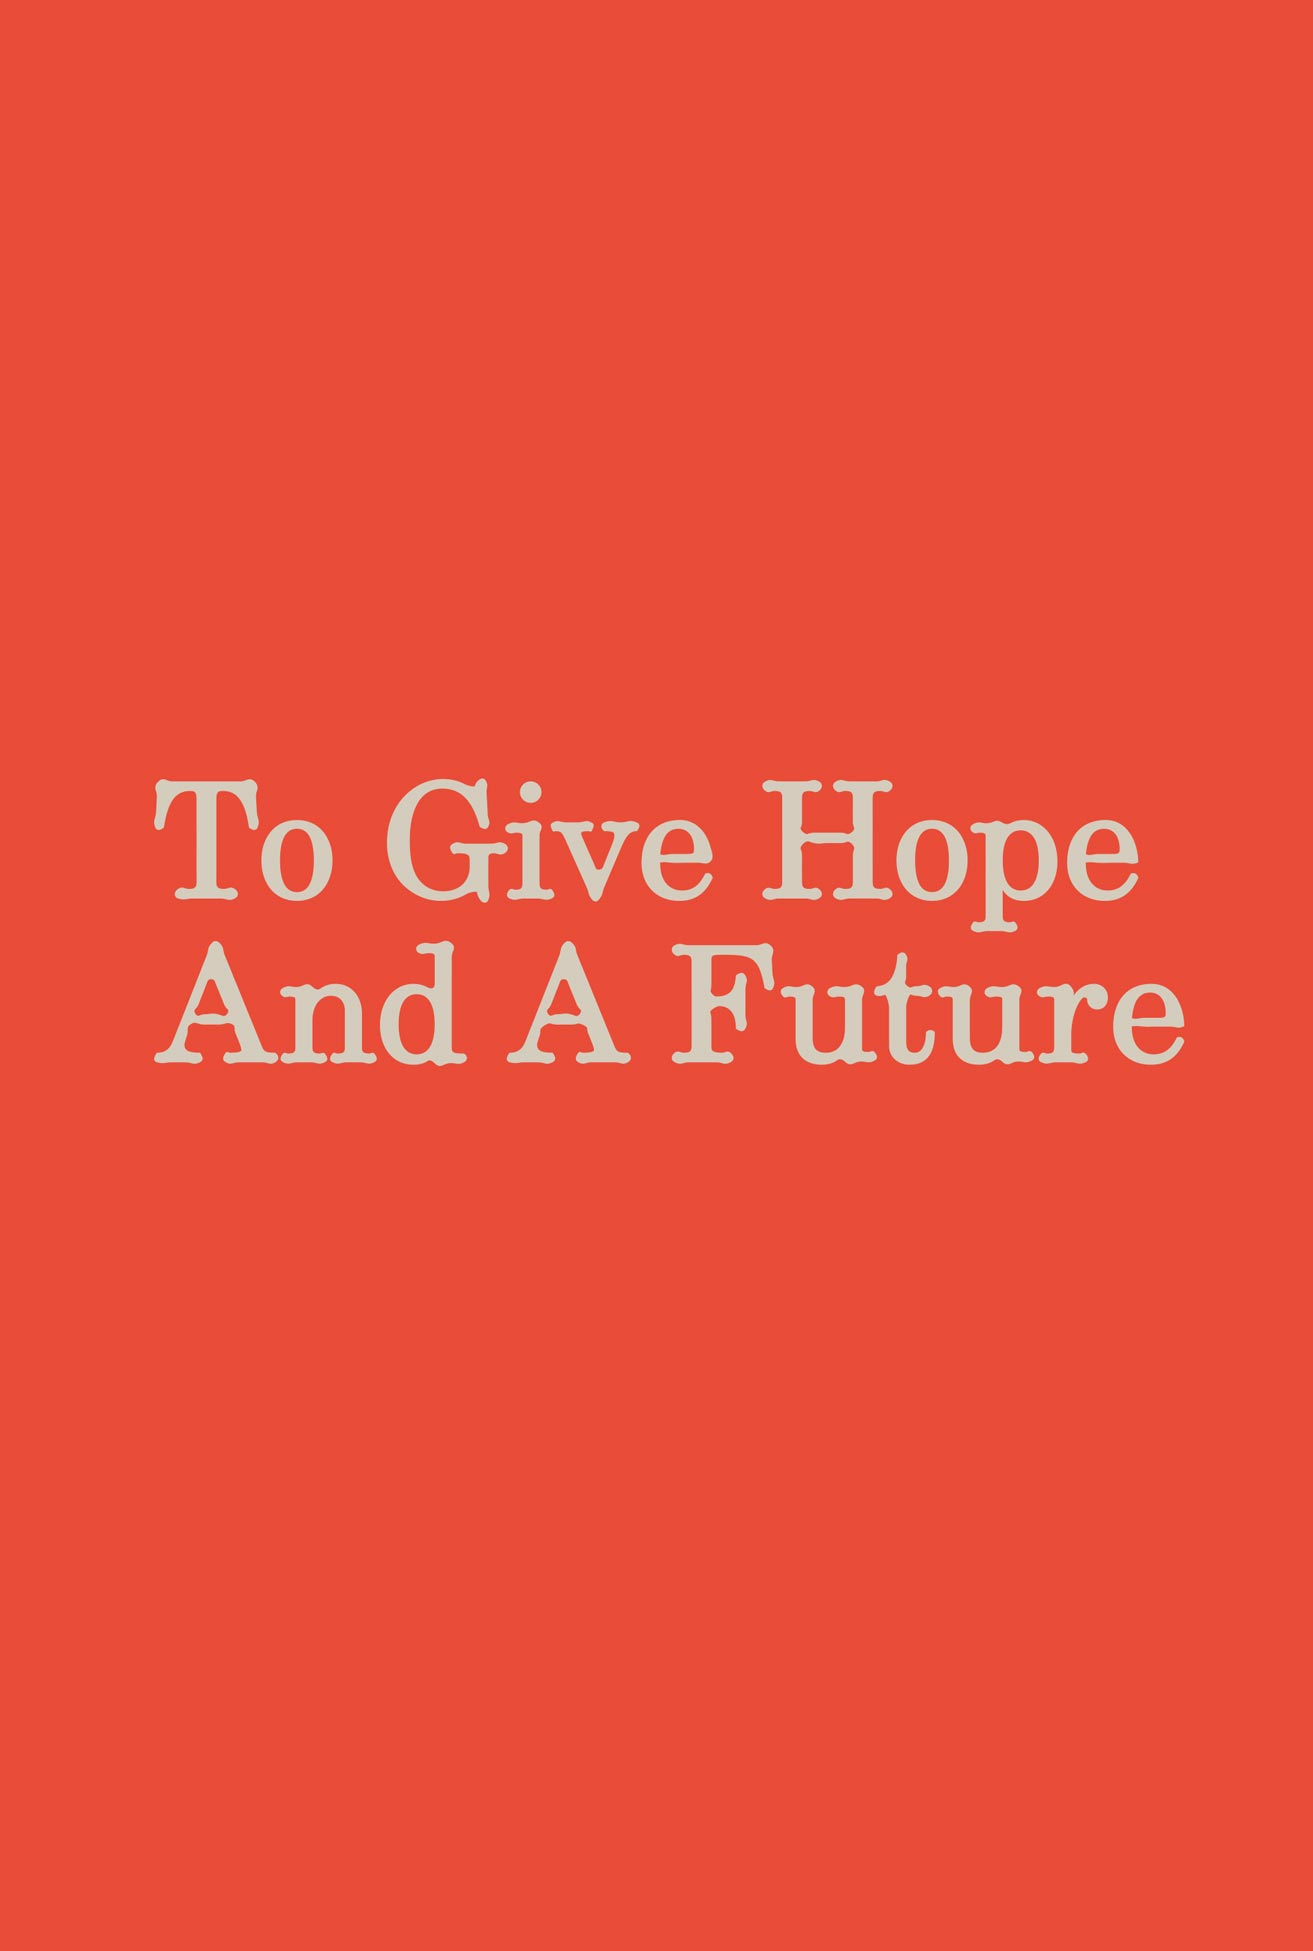 orphanshade-vert_give-hope.jpg